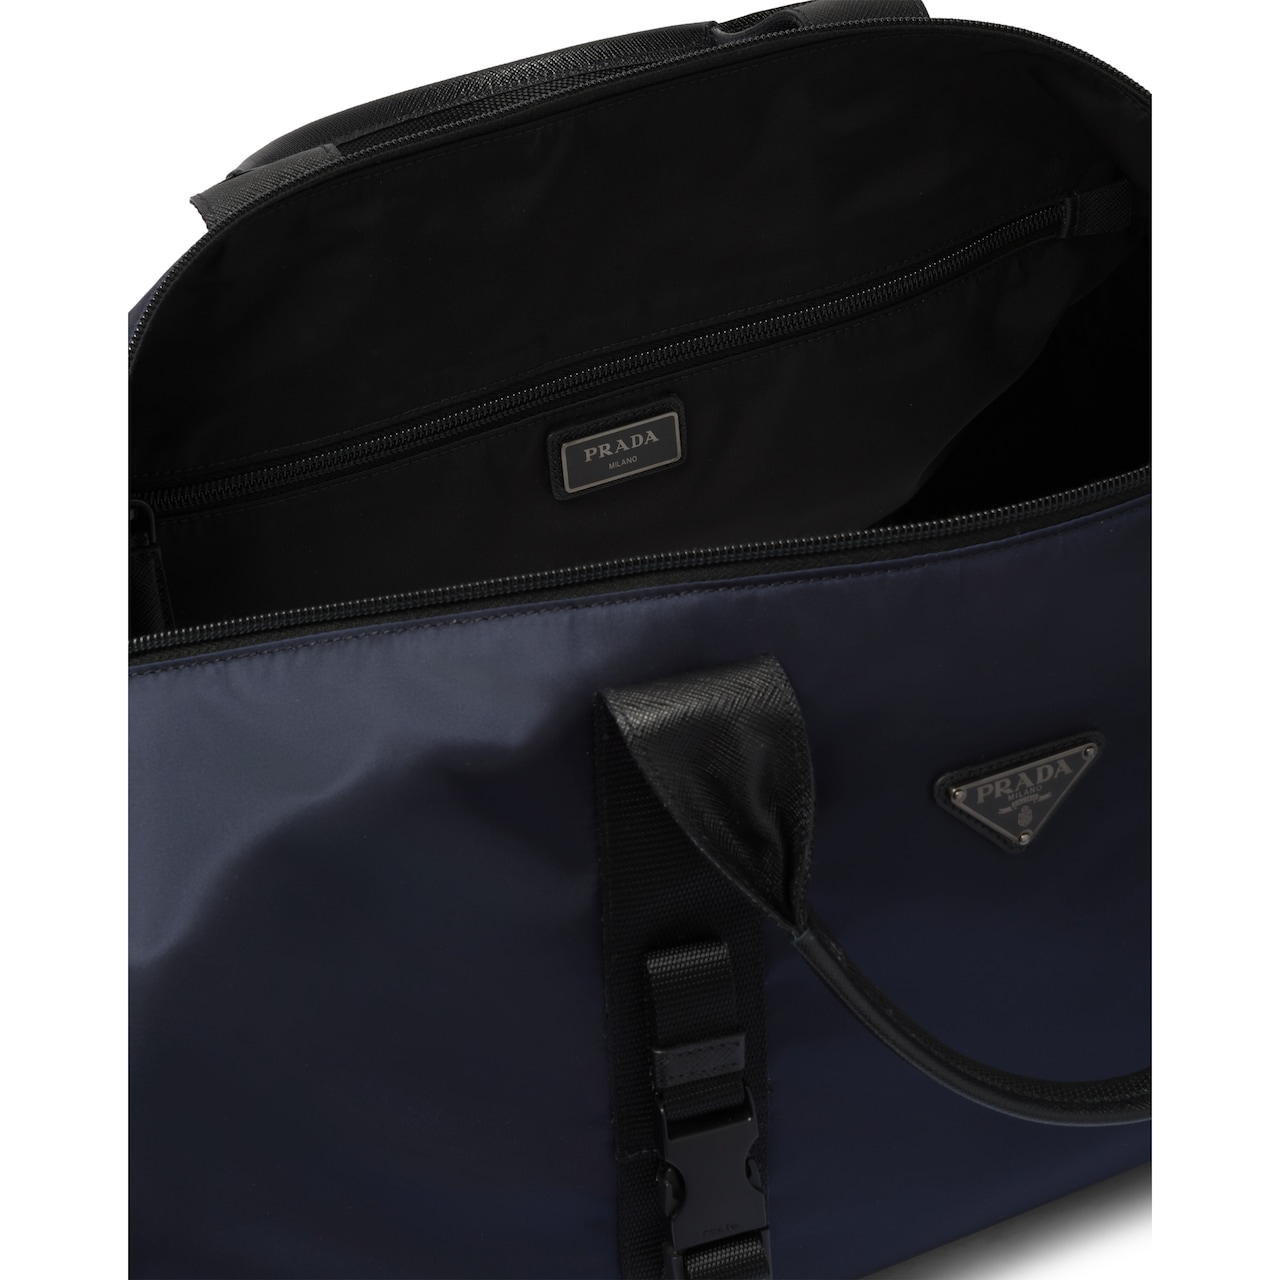 Prada Re-Nylon travel bag